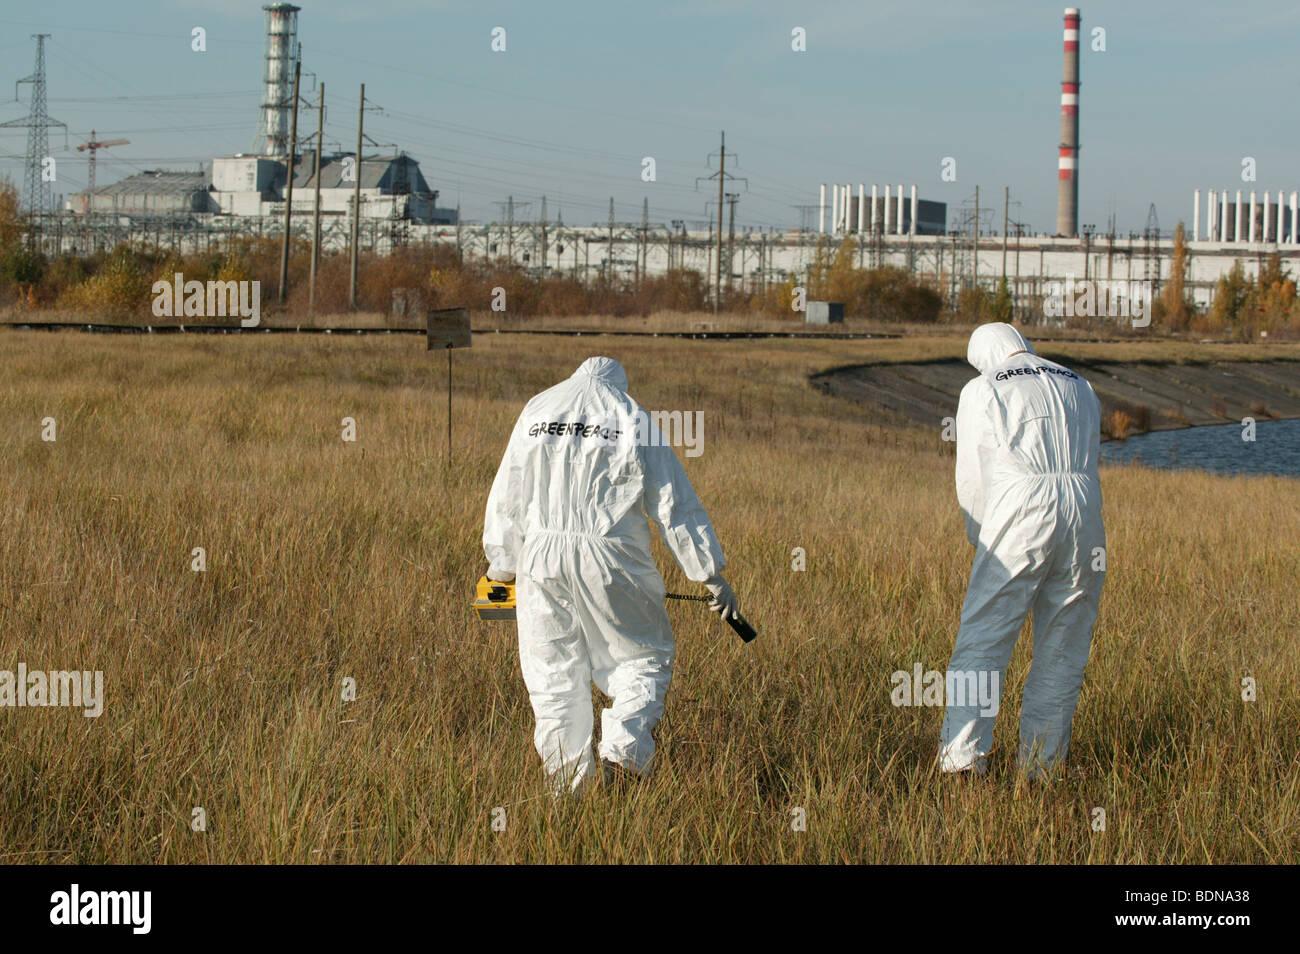 On the ground action training for Greenpeace Radiation Safety Advisors. Measuring radiation levels. - Stock Image